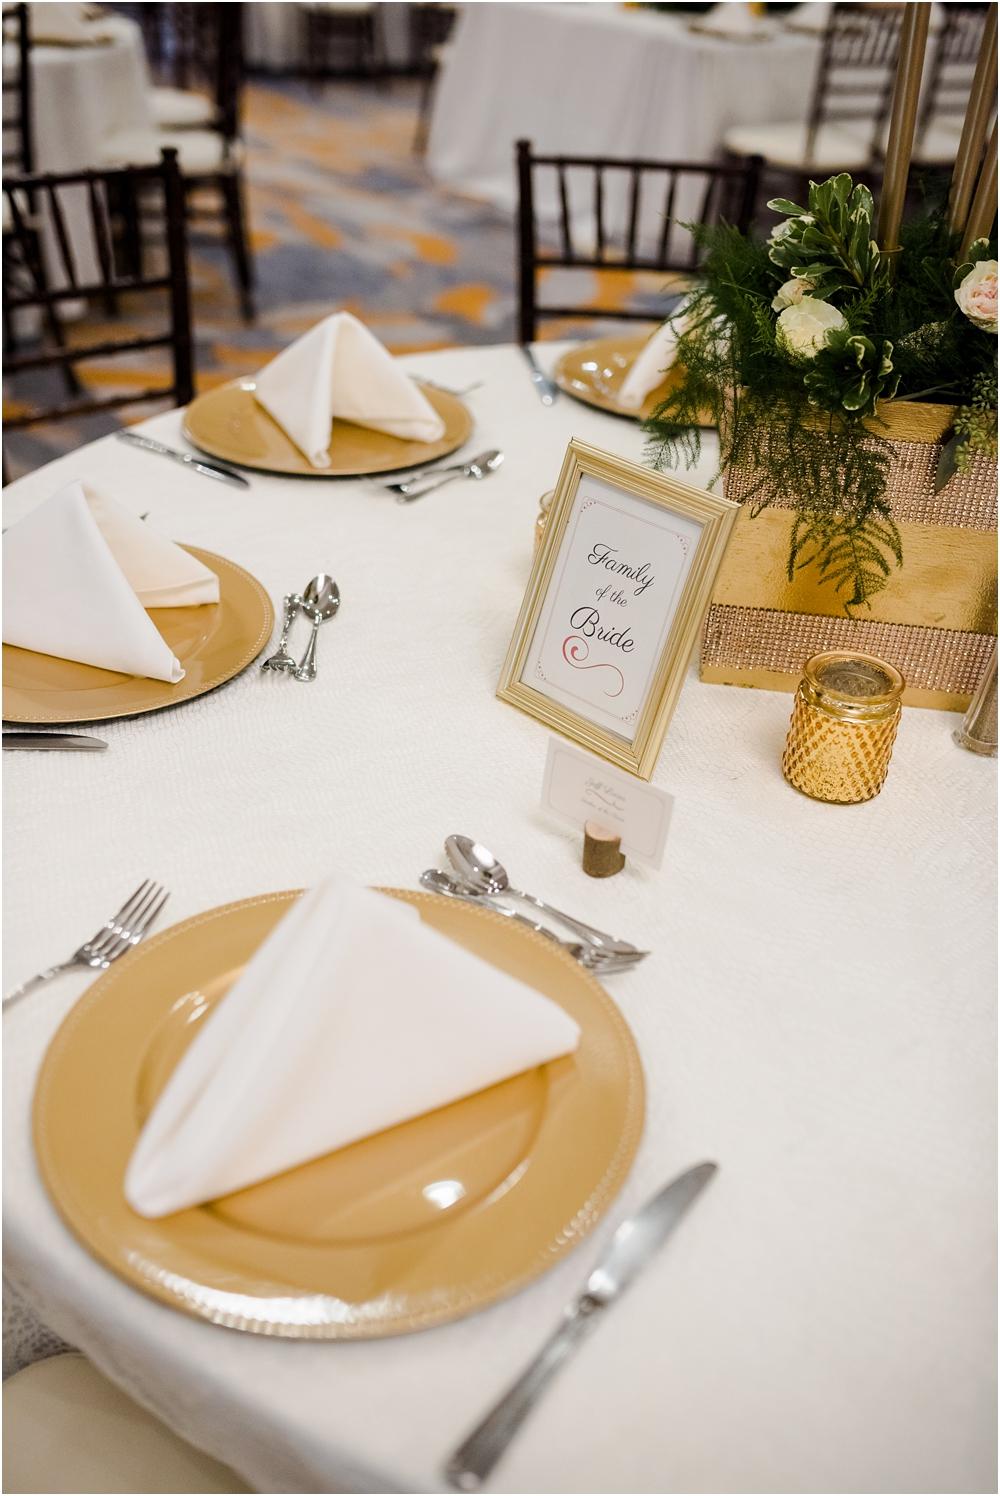 amack-wedding-kiersten-stevenson-photography-30a-panama-city-beach-dothan-tallahassee-(305-of-882).JPG